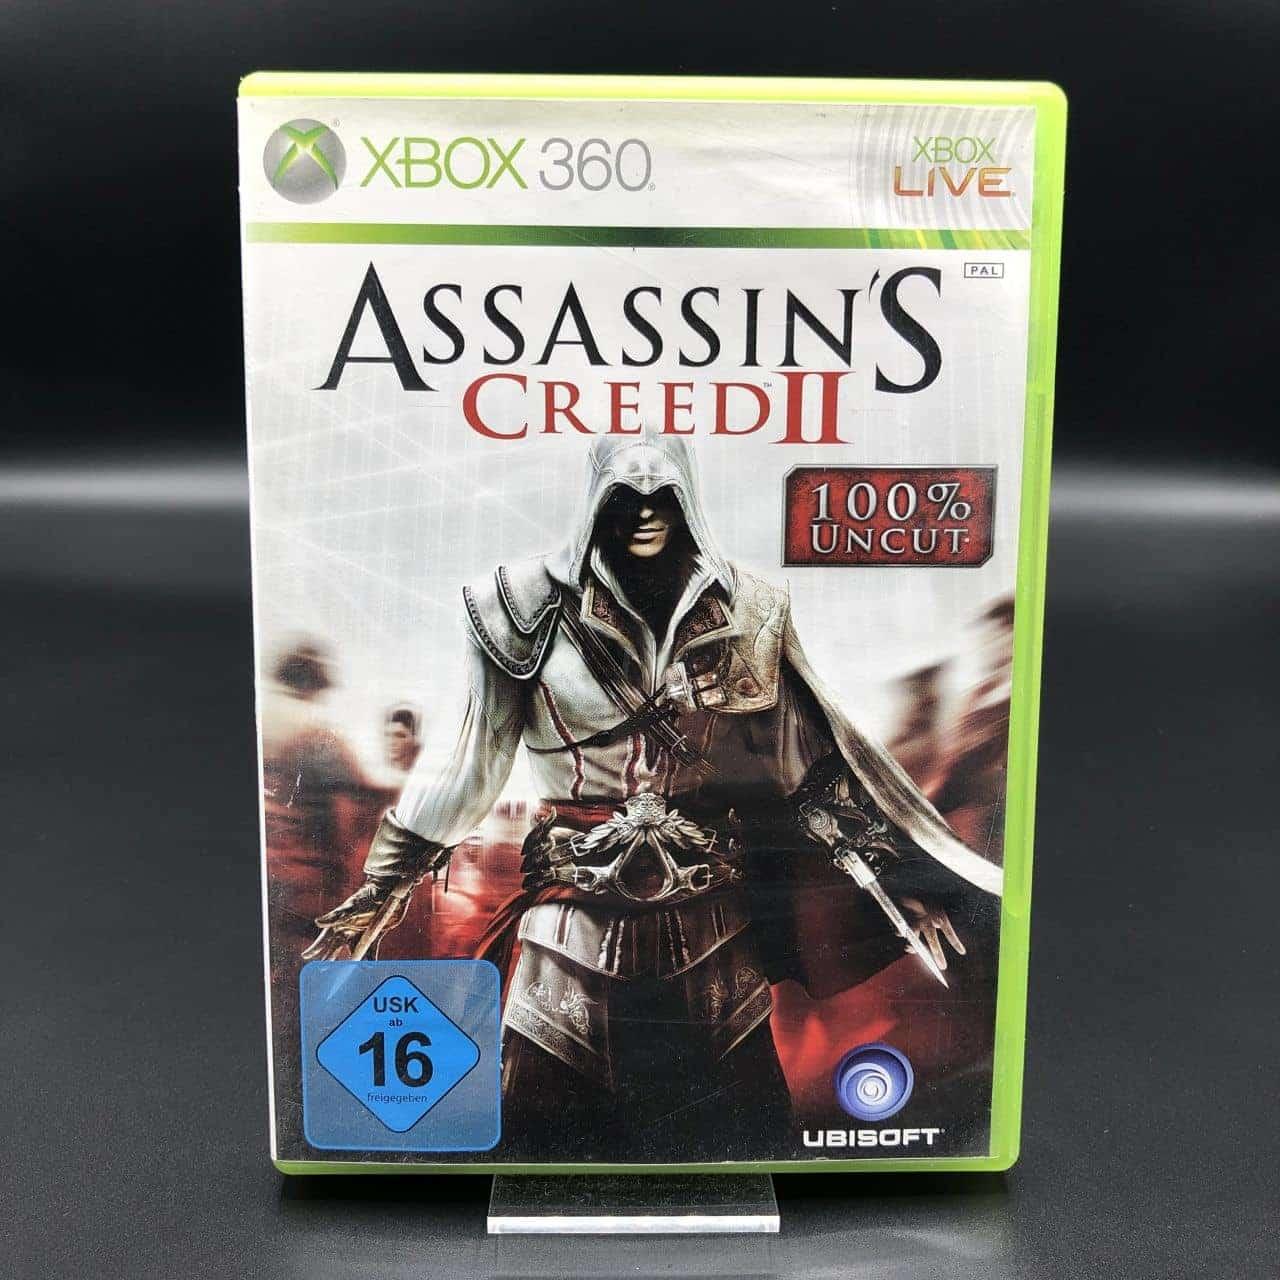 Assassin's Creed II (Komplett) (Sehr gut) Xbox 360